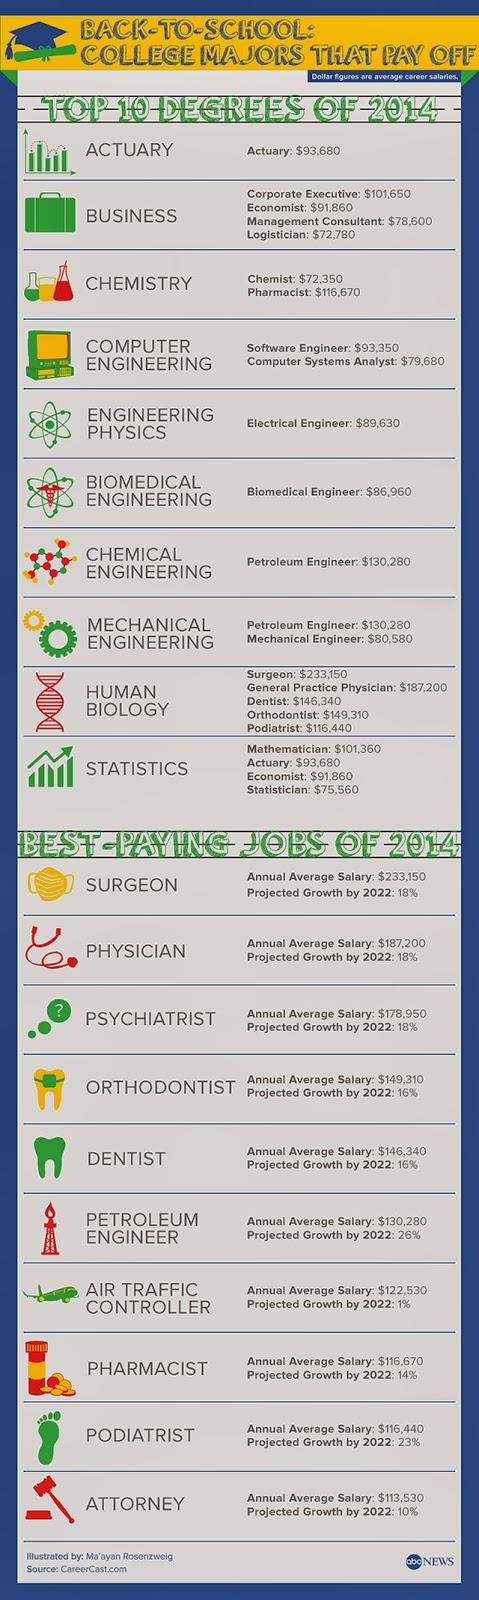 http://abcnews.go.com/Business/highest-earning-majors-back-school/story?id=24961735